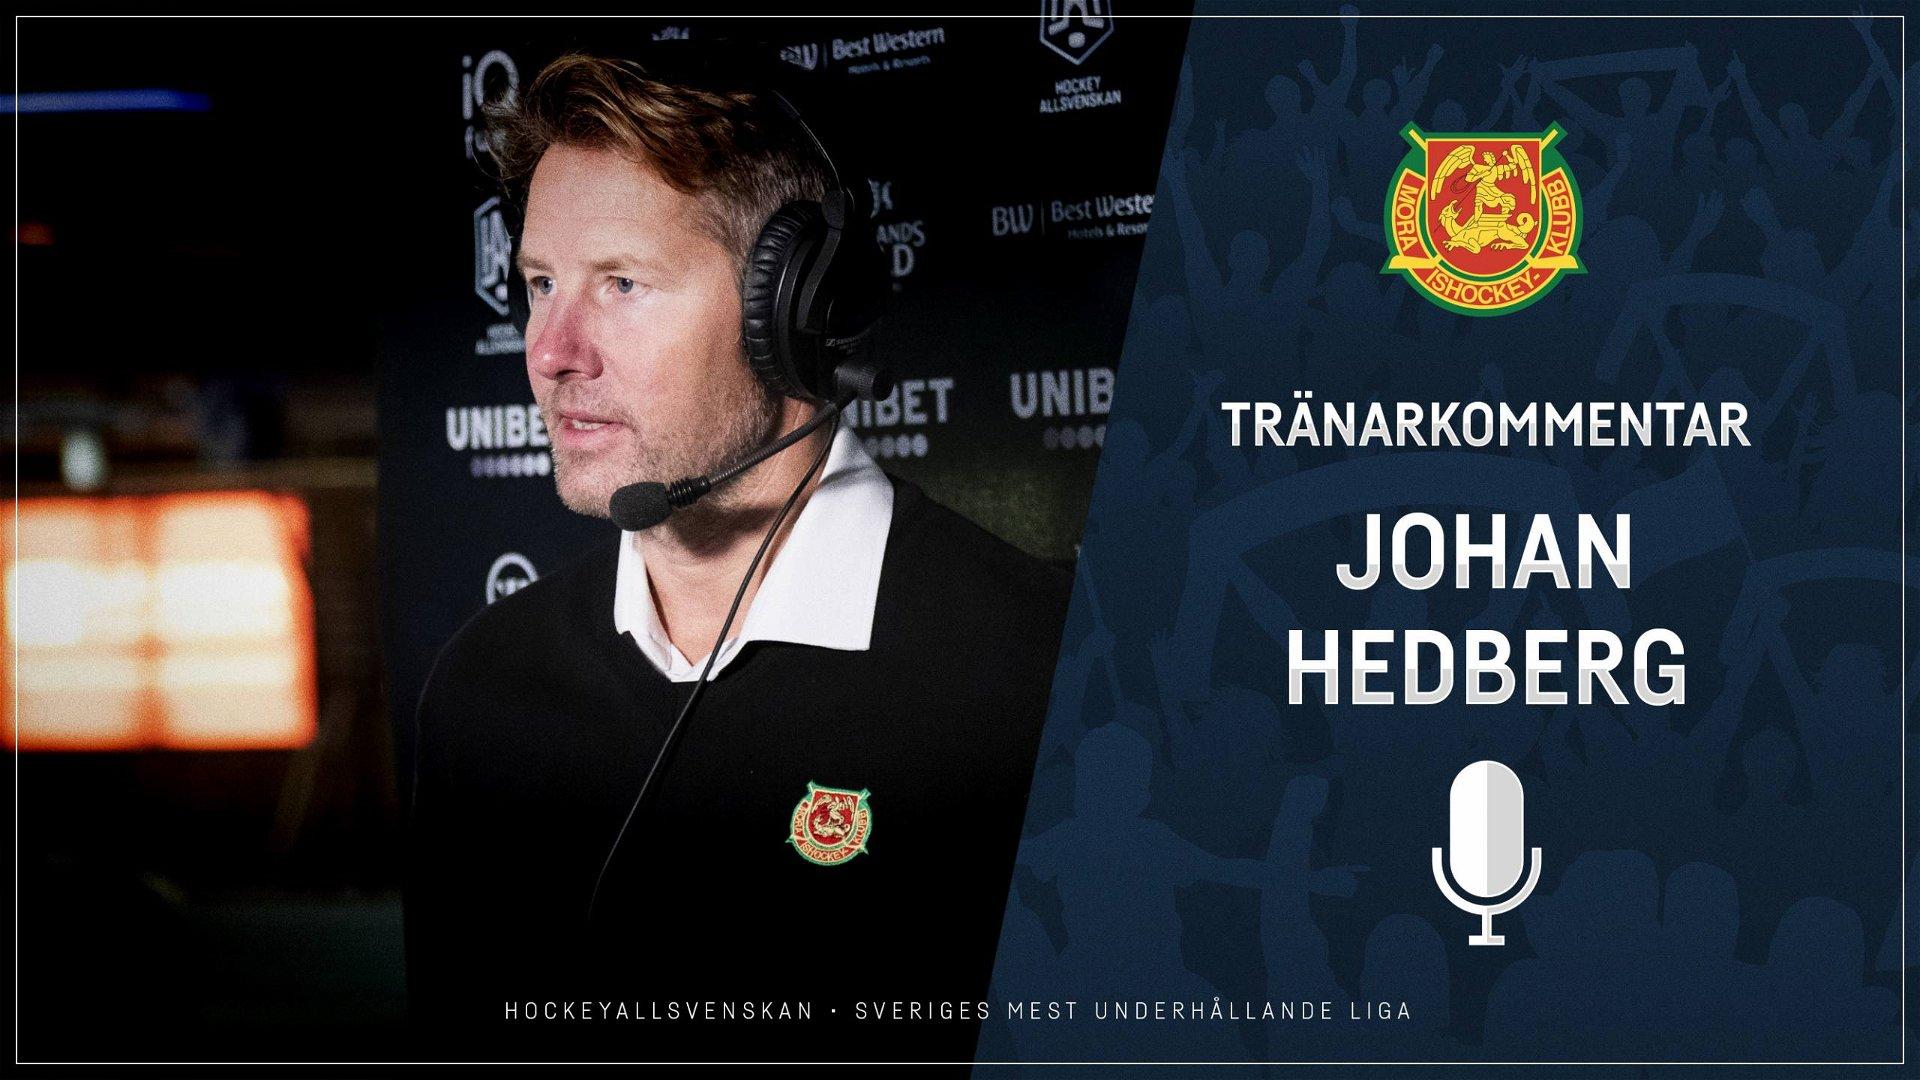 2020-12-29 Segerintervju: Johan Hedberg